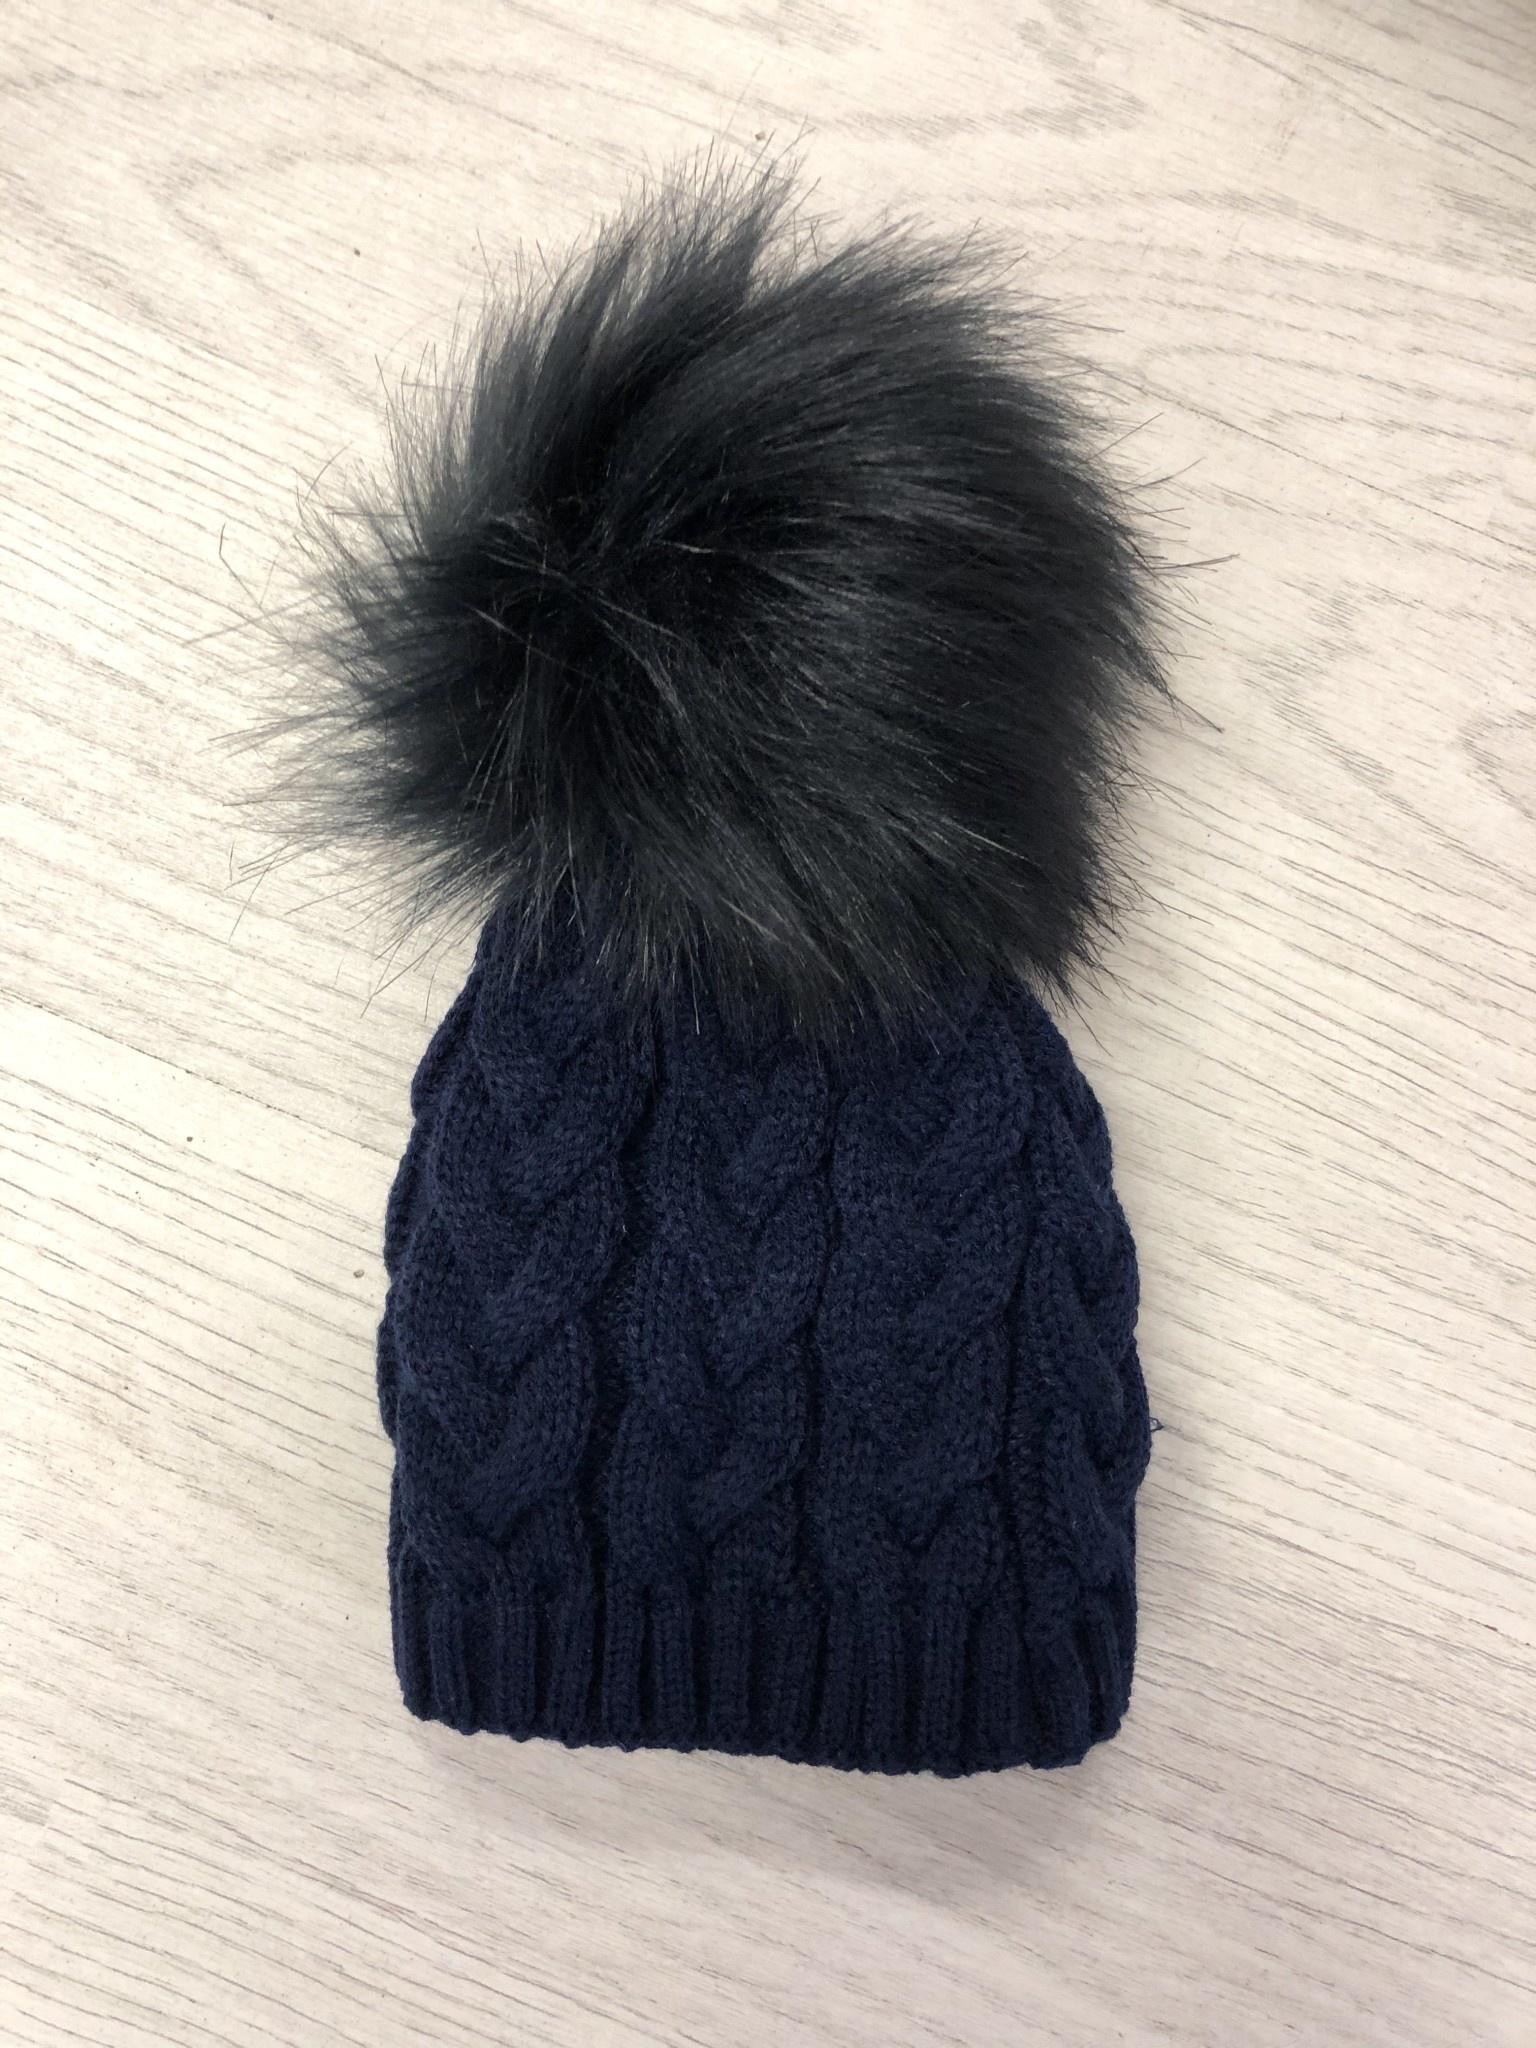 Pex Pex Knit Navy Hat With Faux Fur Pom